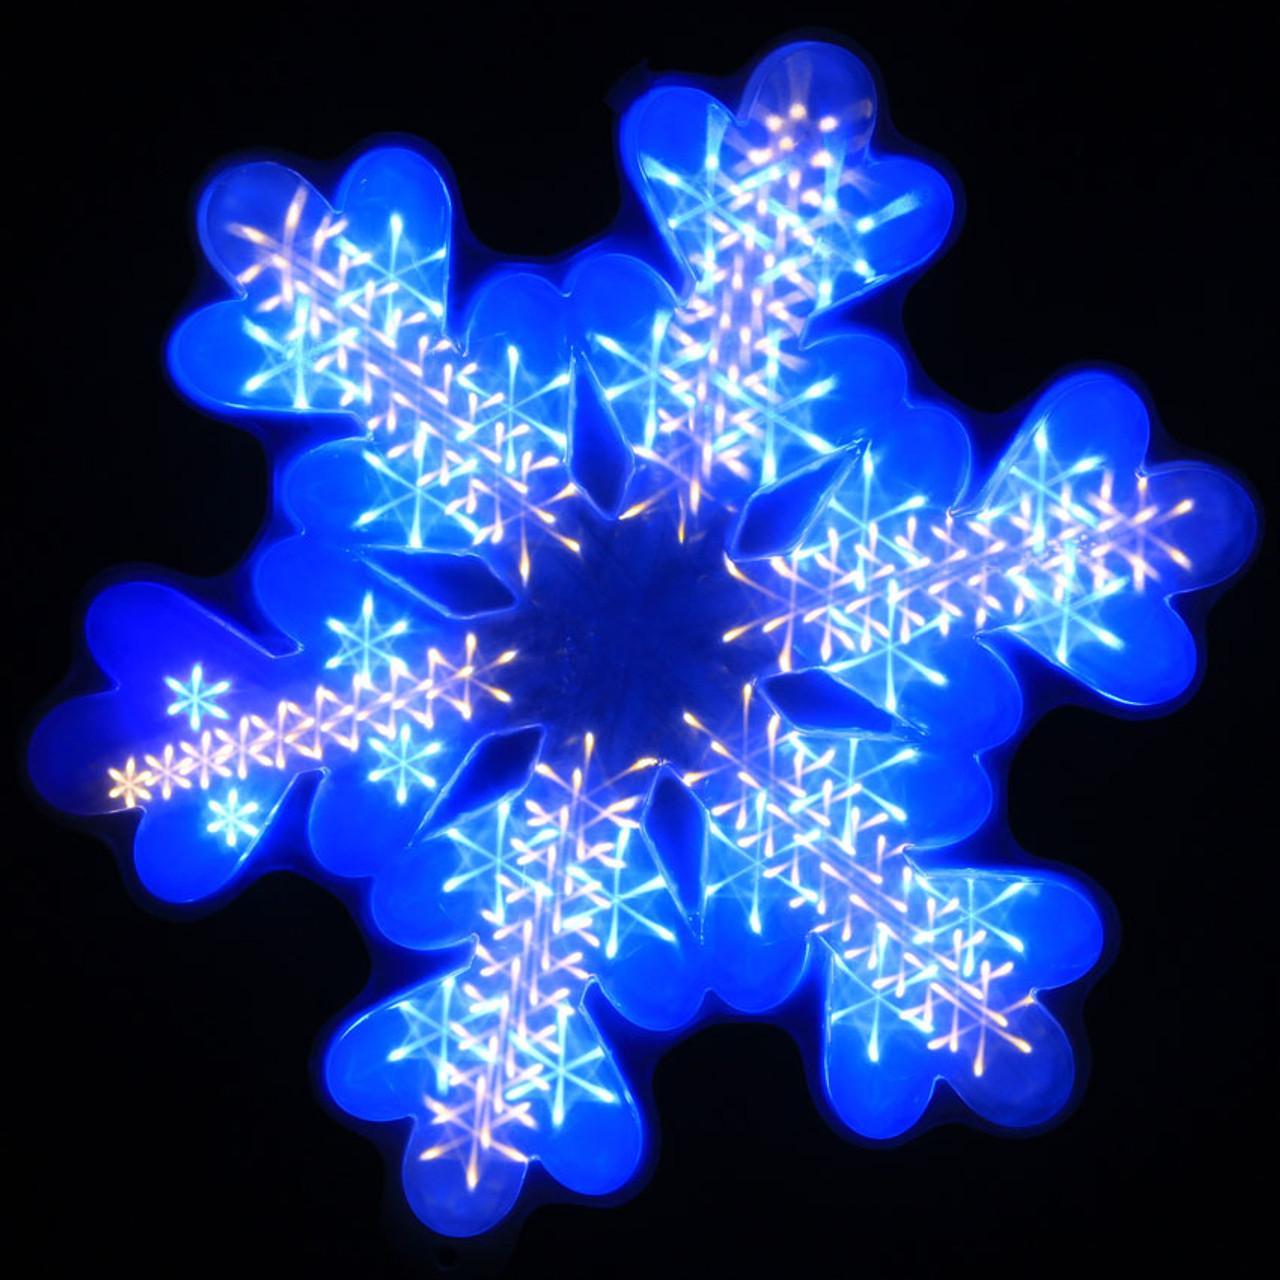 Snowflake Christmas Lights.47cm 3d White And Blue Led Snowfall Function Snowflake Christmas Window Lights